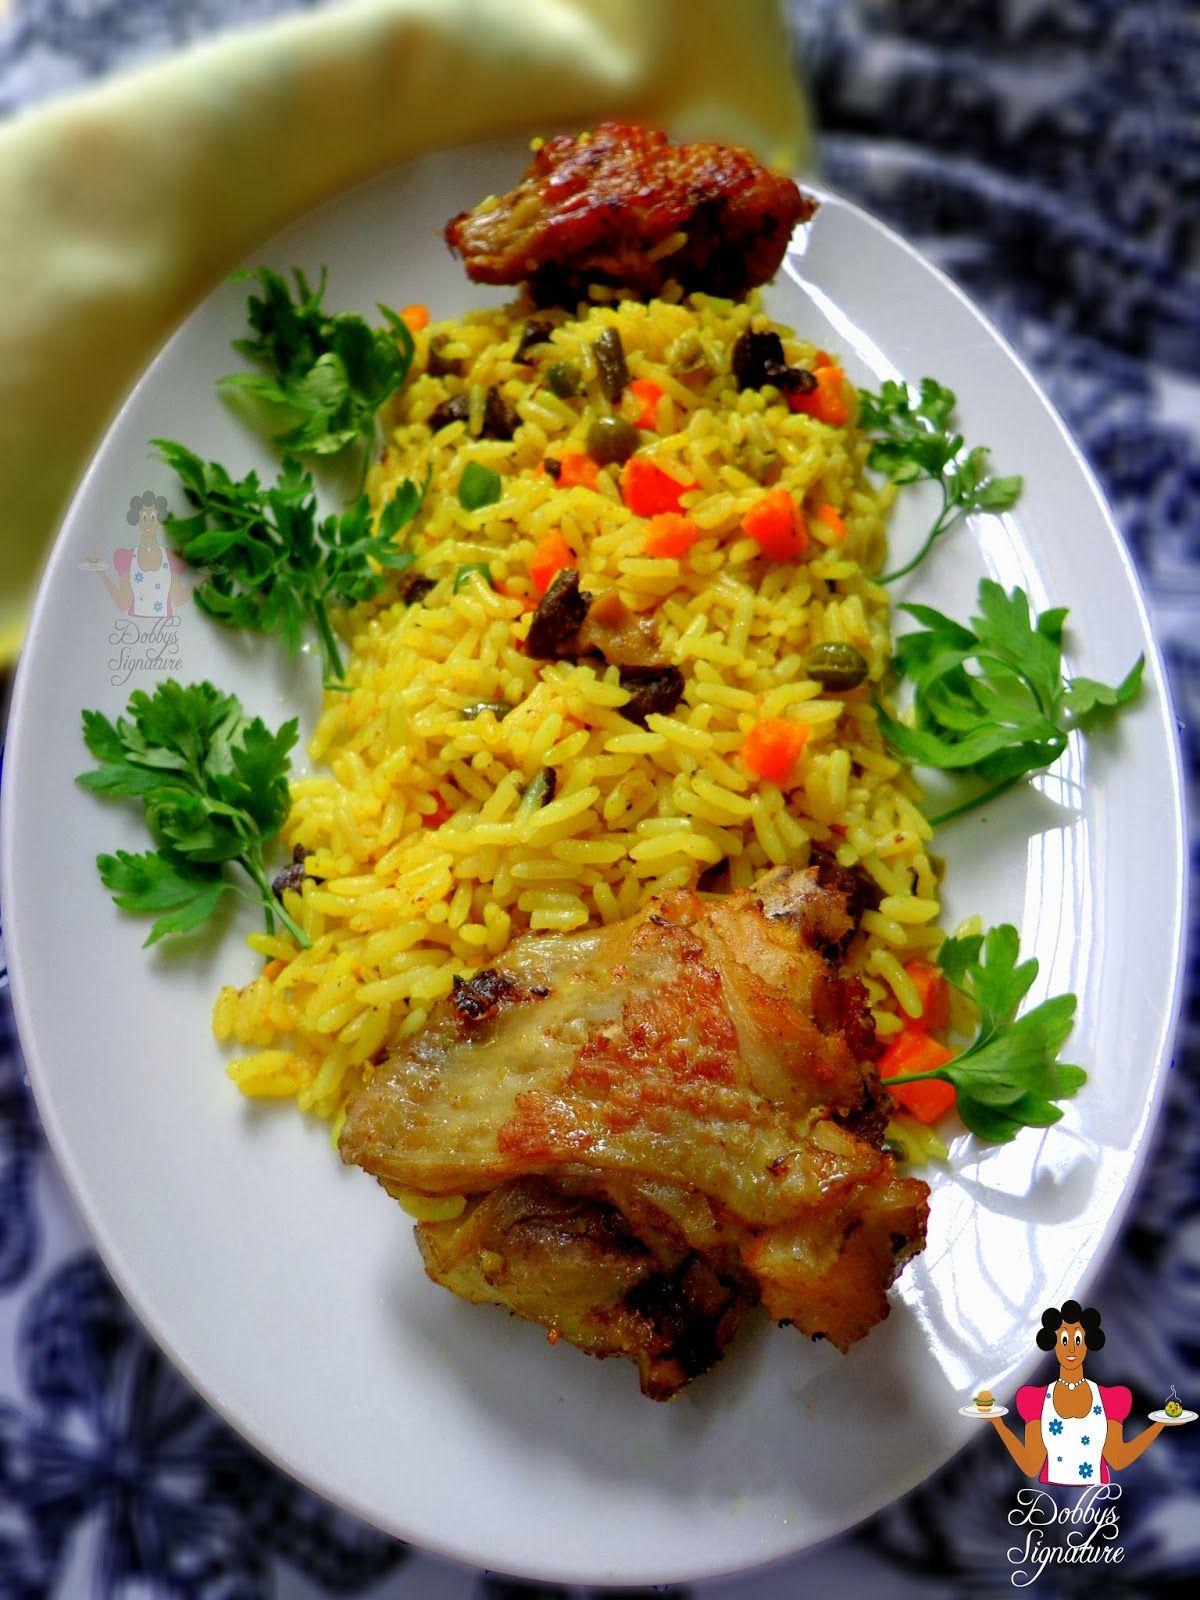 Dobbys signature nigerian food blog nigerian food recipes dobbys signature nigerian food blog nigerian food recipes african food blog nigerian forumfinder Gallery